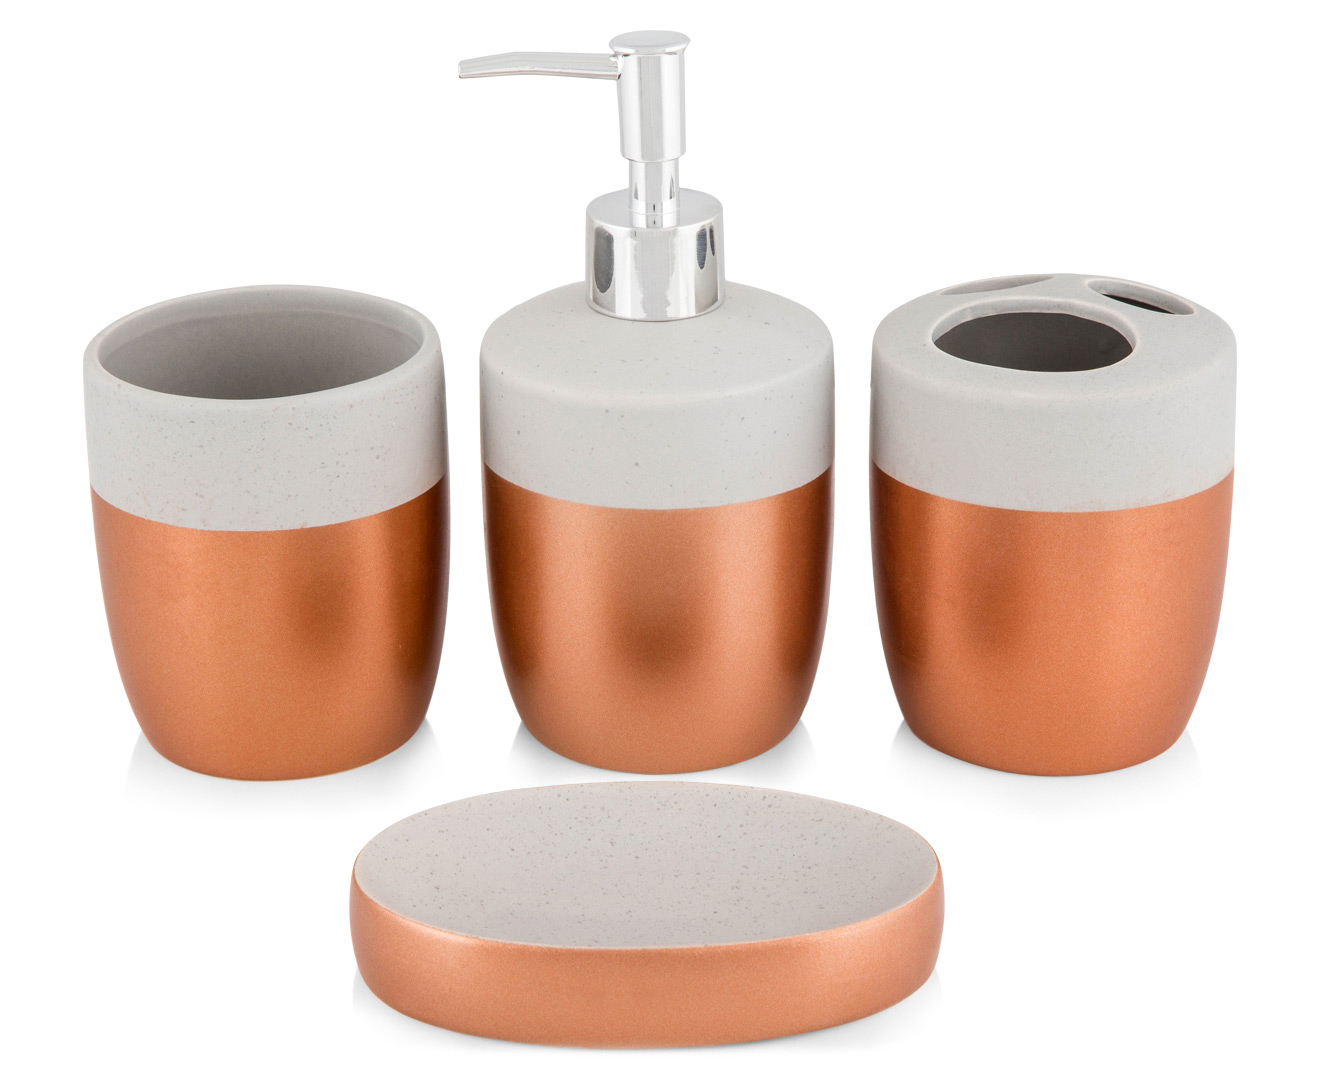 Cooper & Co. Bathroom Accessories 4-Pack - Copper/Concrete | Catch ...